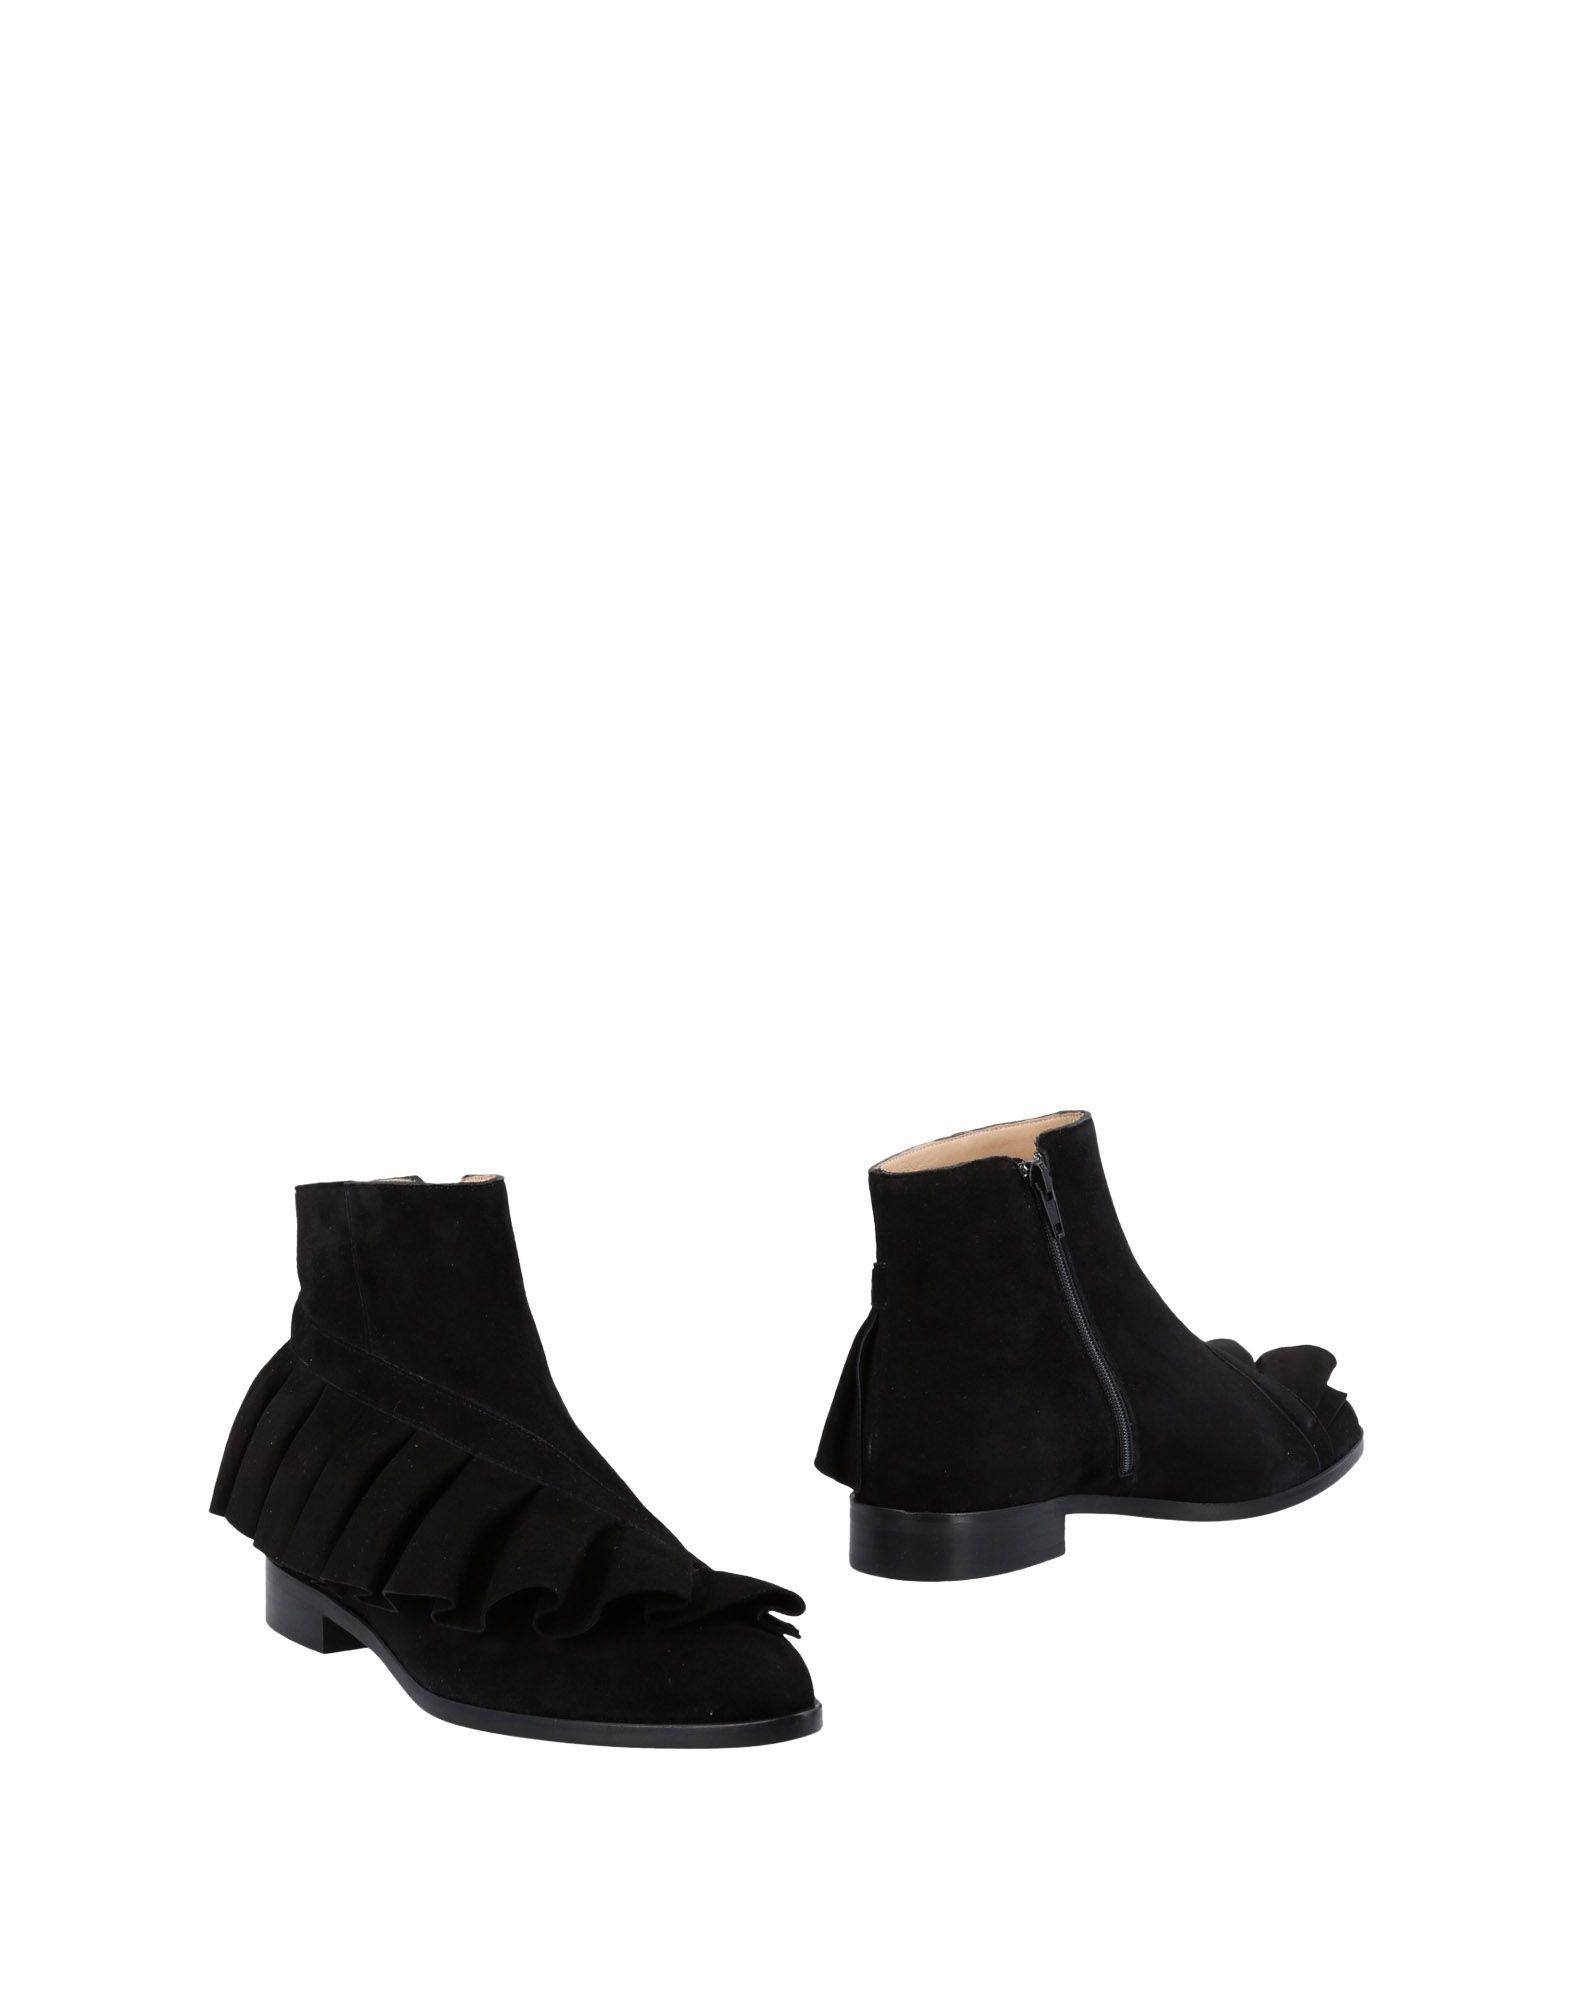 Marie Marí Stiefelette Damen  11484120KE Gute Qualität beliebte Schuhe